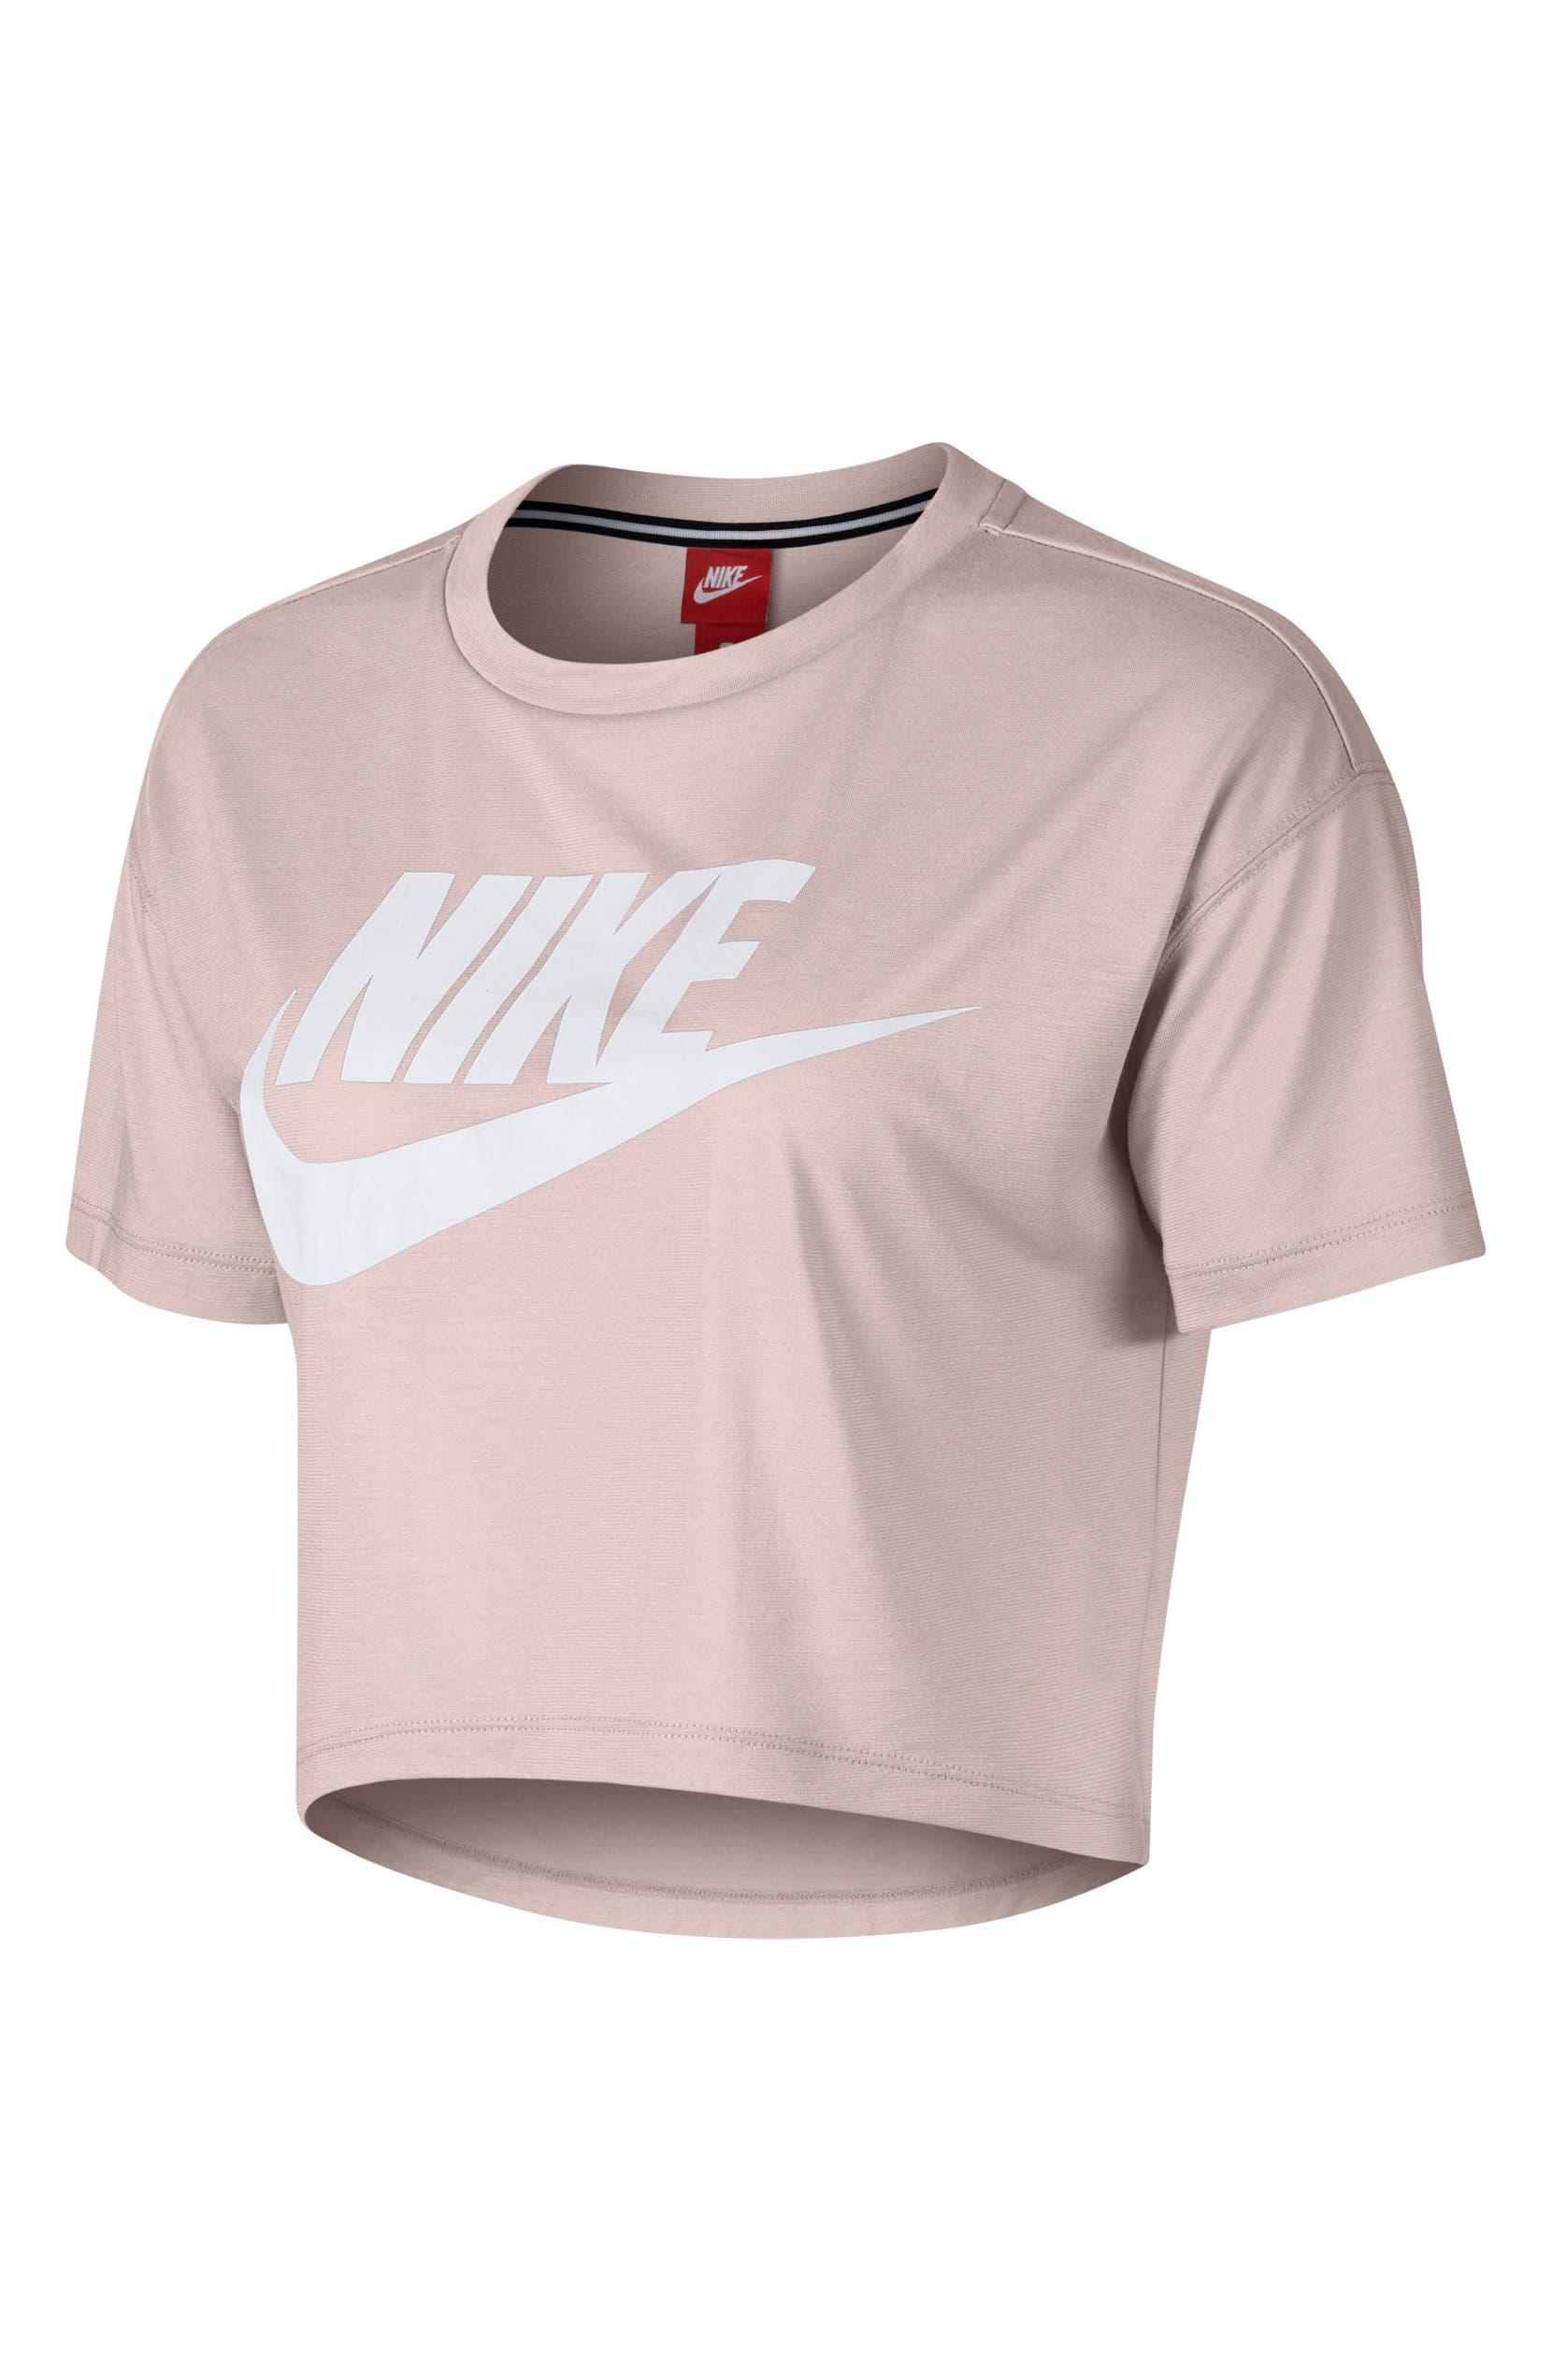 dad7421cd86 Sportswear Essential Women's Crop Top